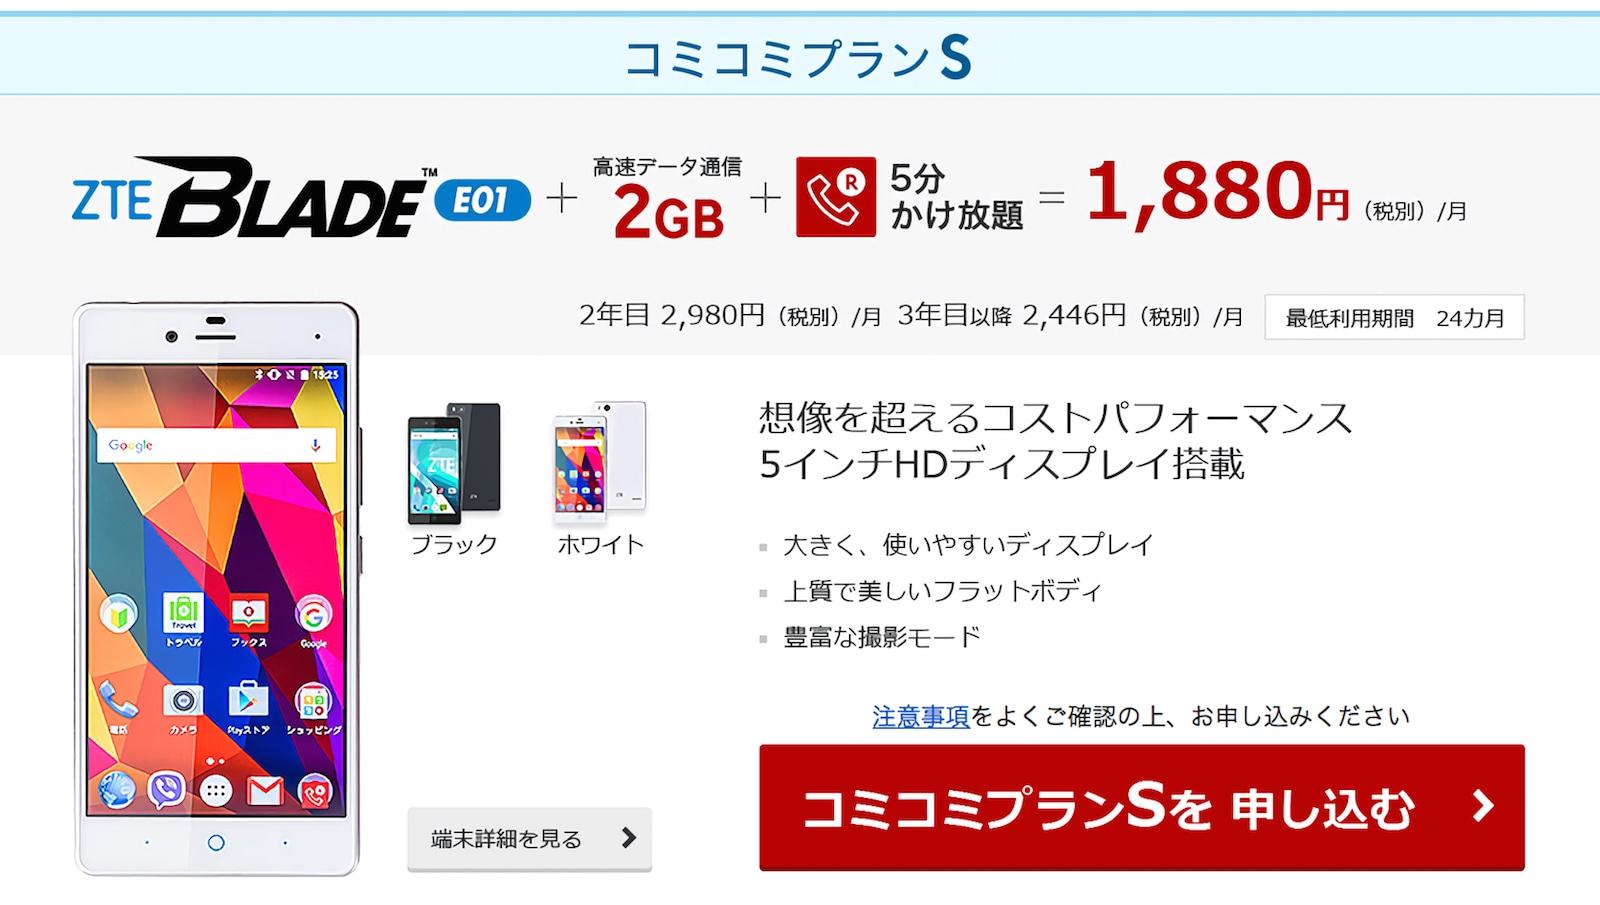 rakuten-mobile-device-plan-komikomi-s